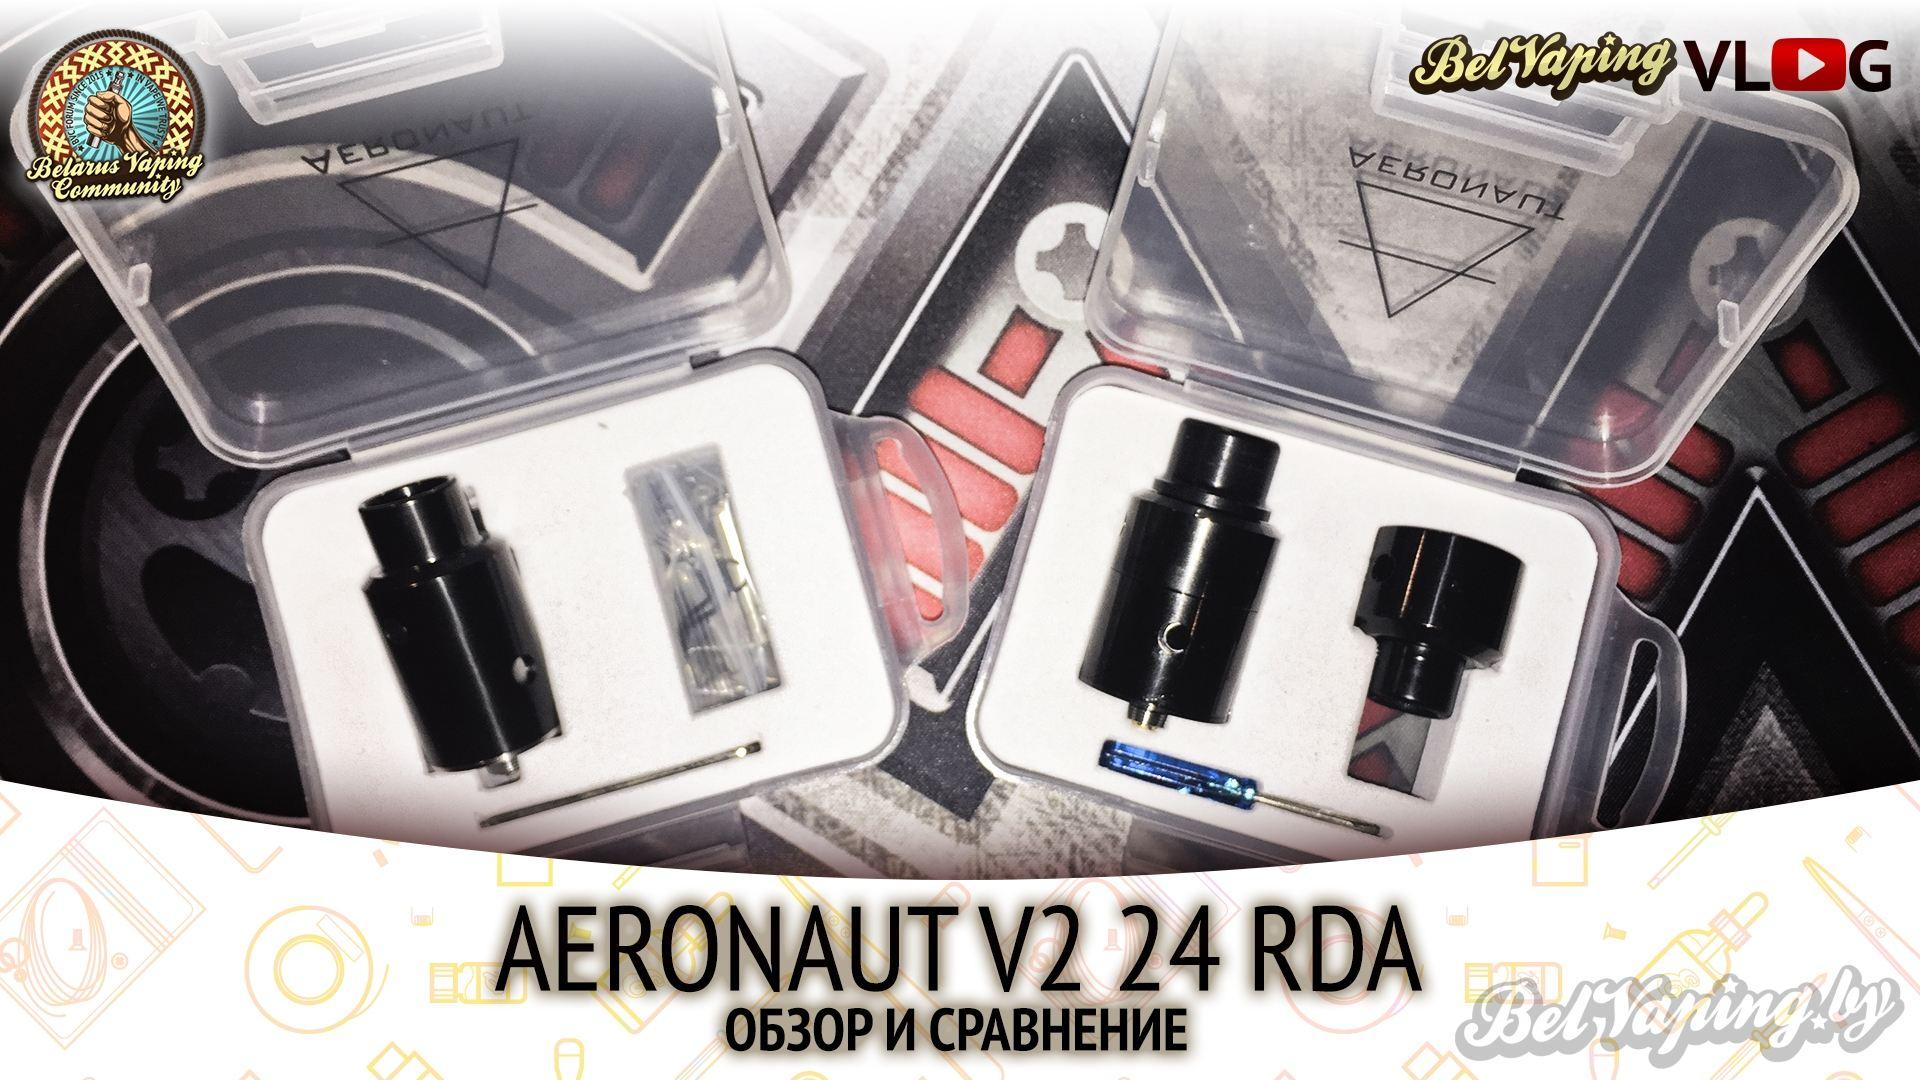 Обзор дрипки Aeronaut V2 RDA 24mm